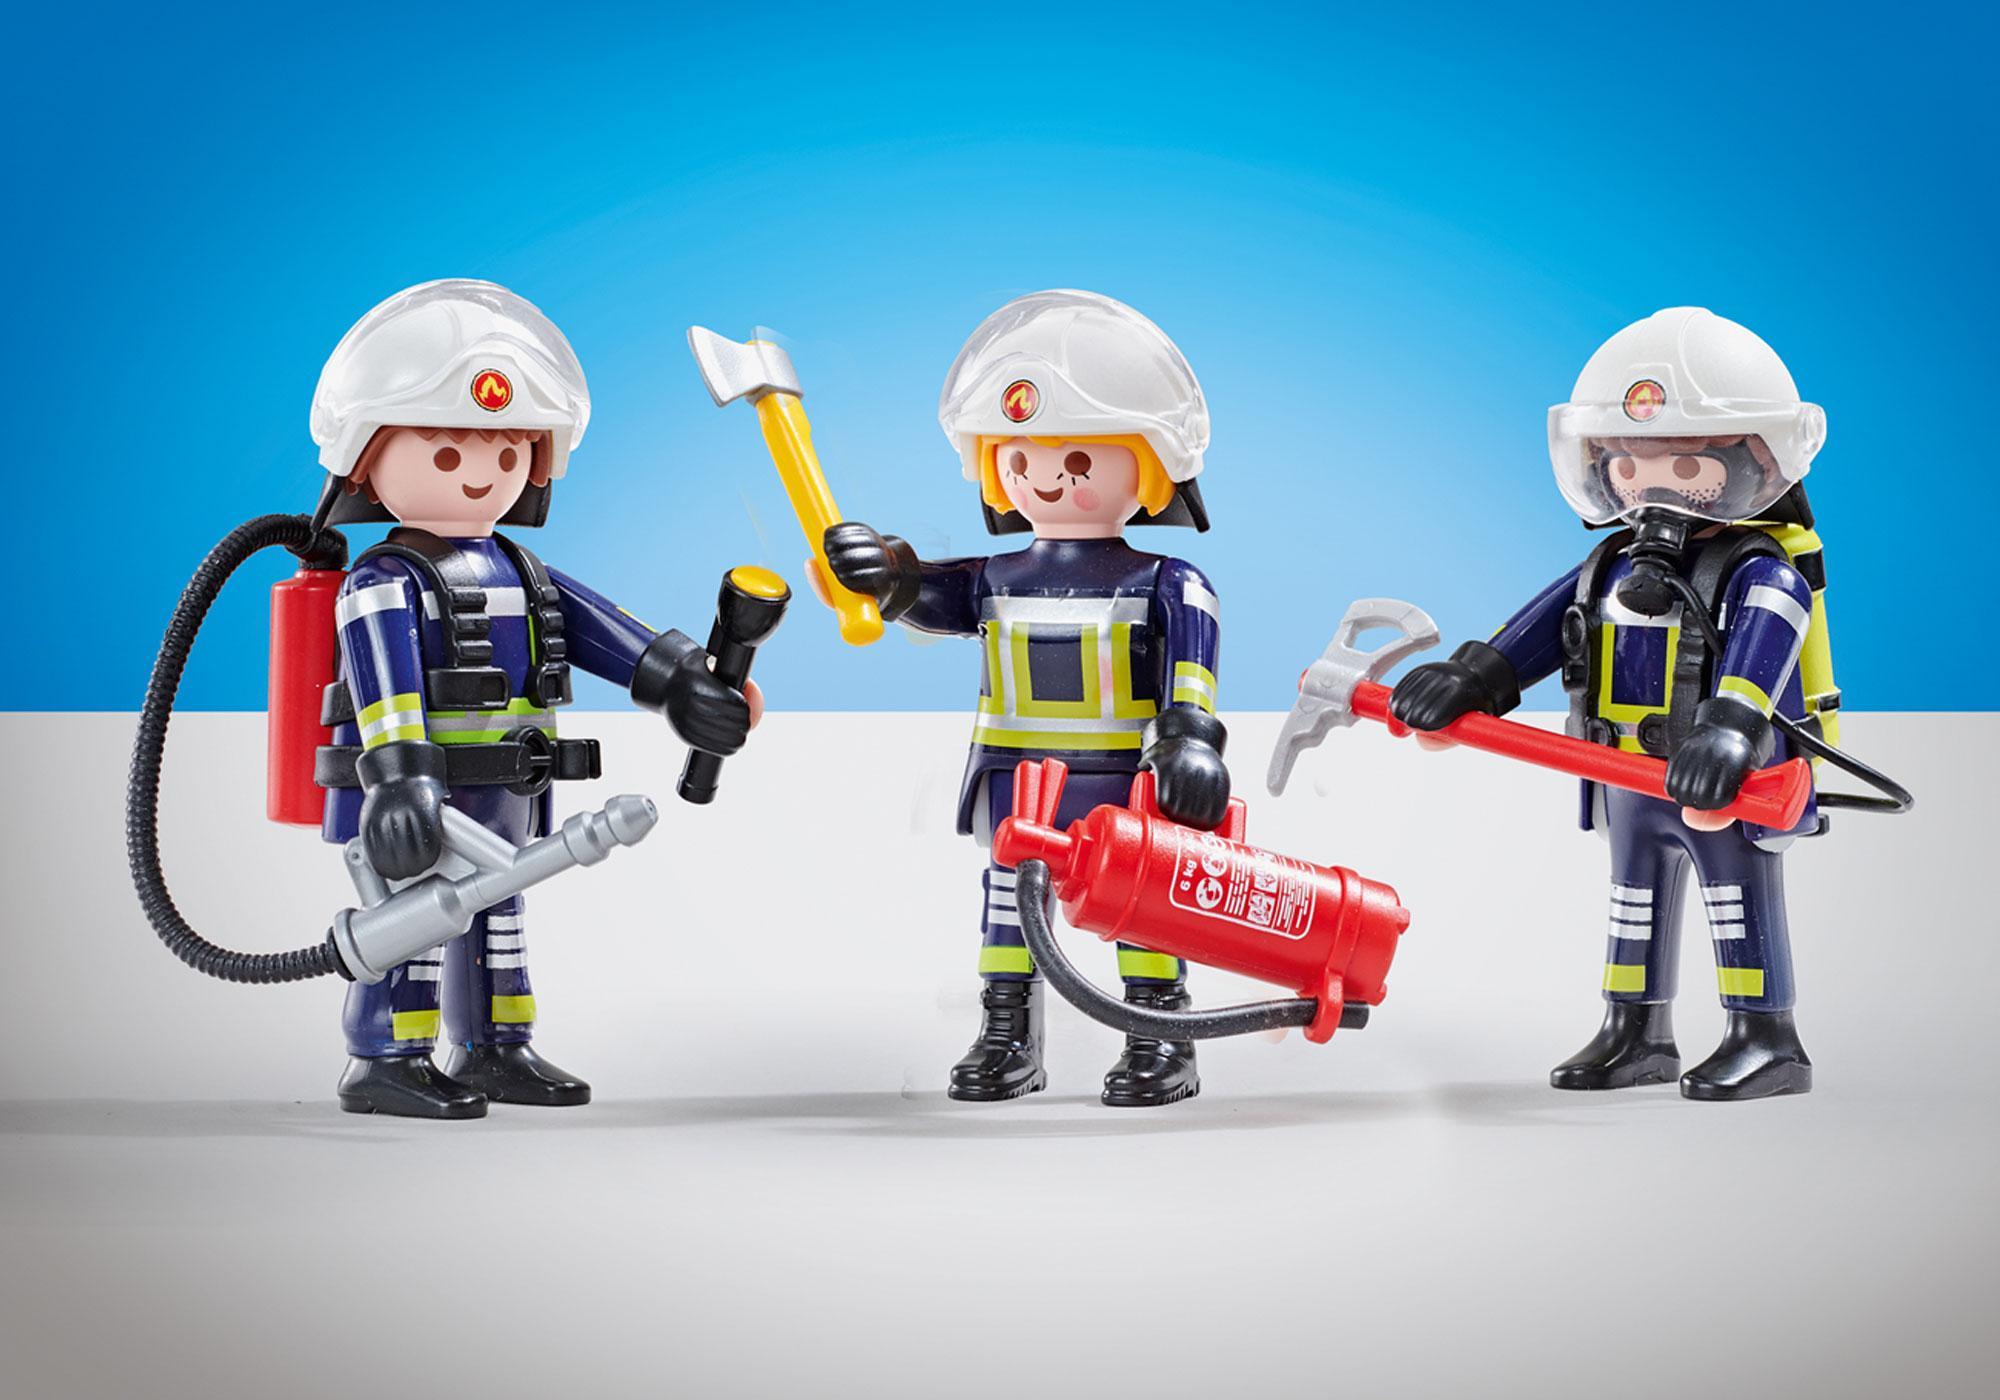 http://media.playmobil.com/i/playmobil/6586_product_detail/Brigade B Firefighters